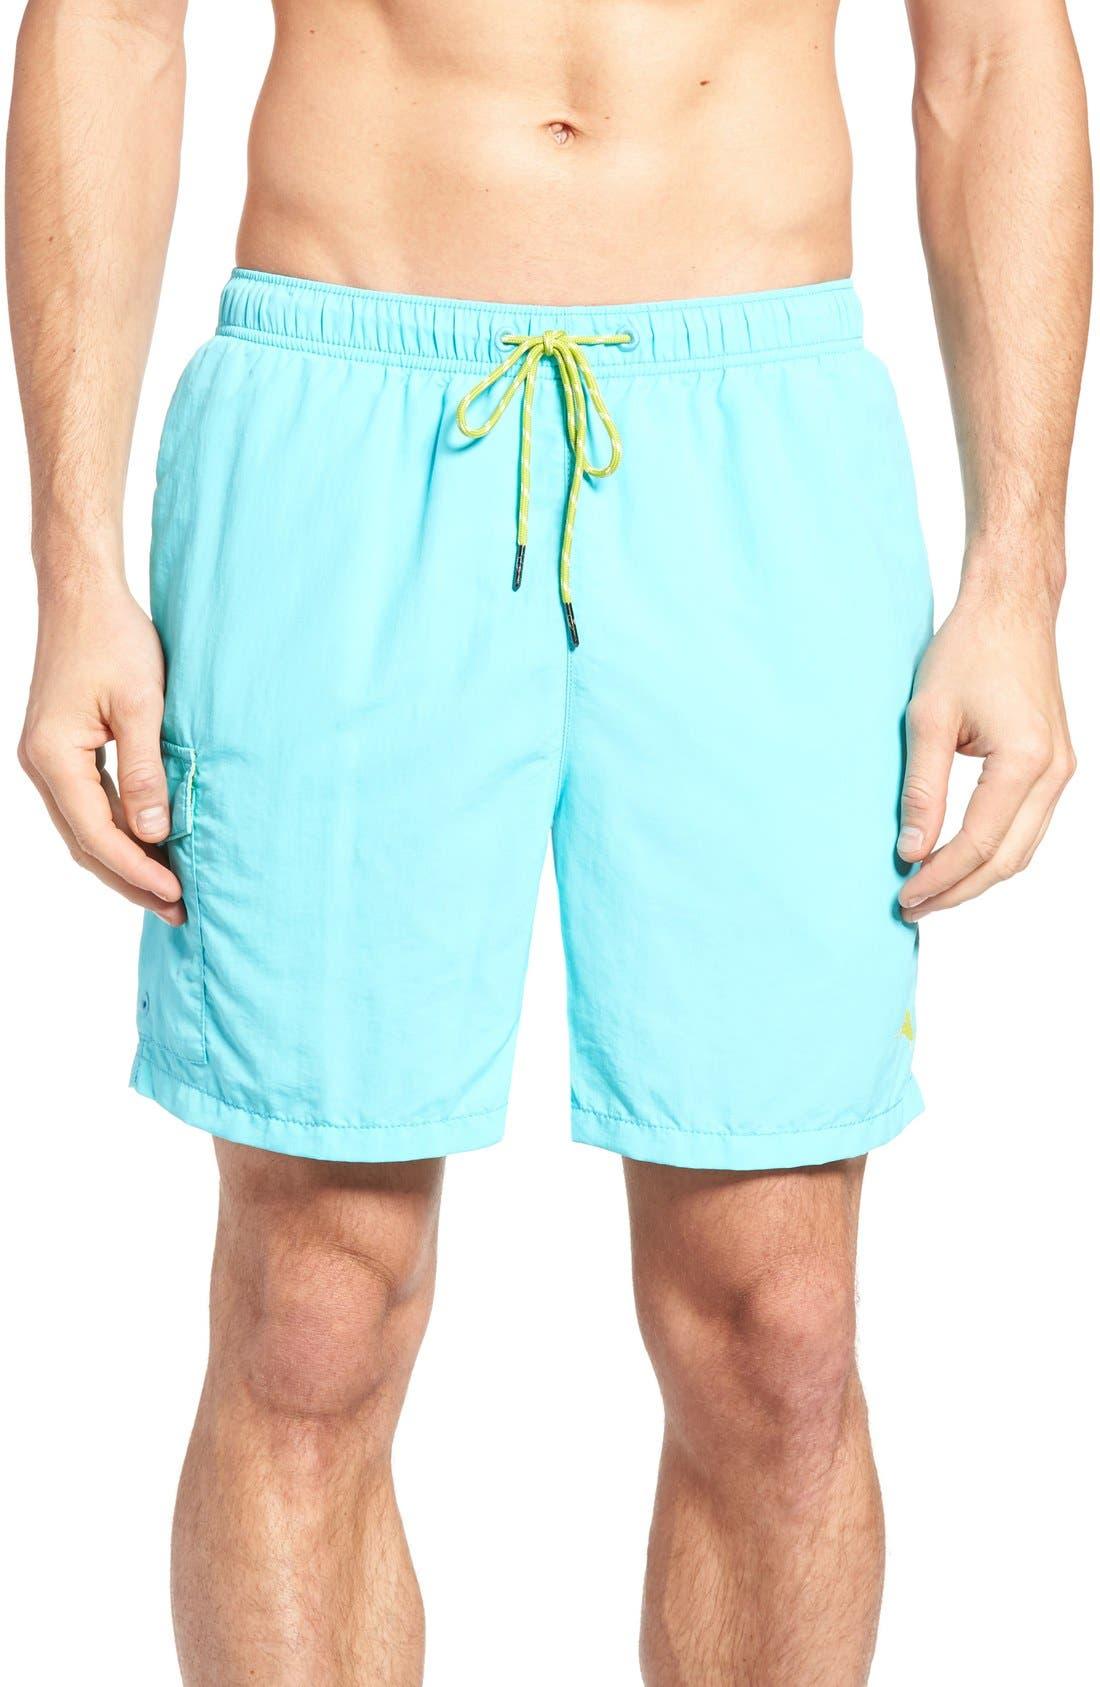 Alternate Image 1 Selected - Tommy Bahama Naples Happy Go Cargo Swim Trunks